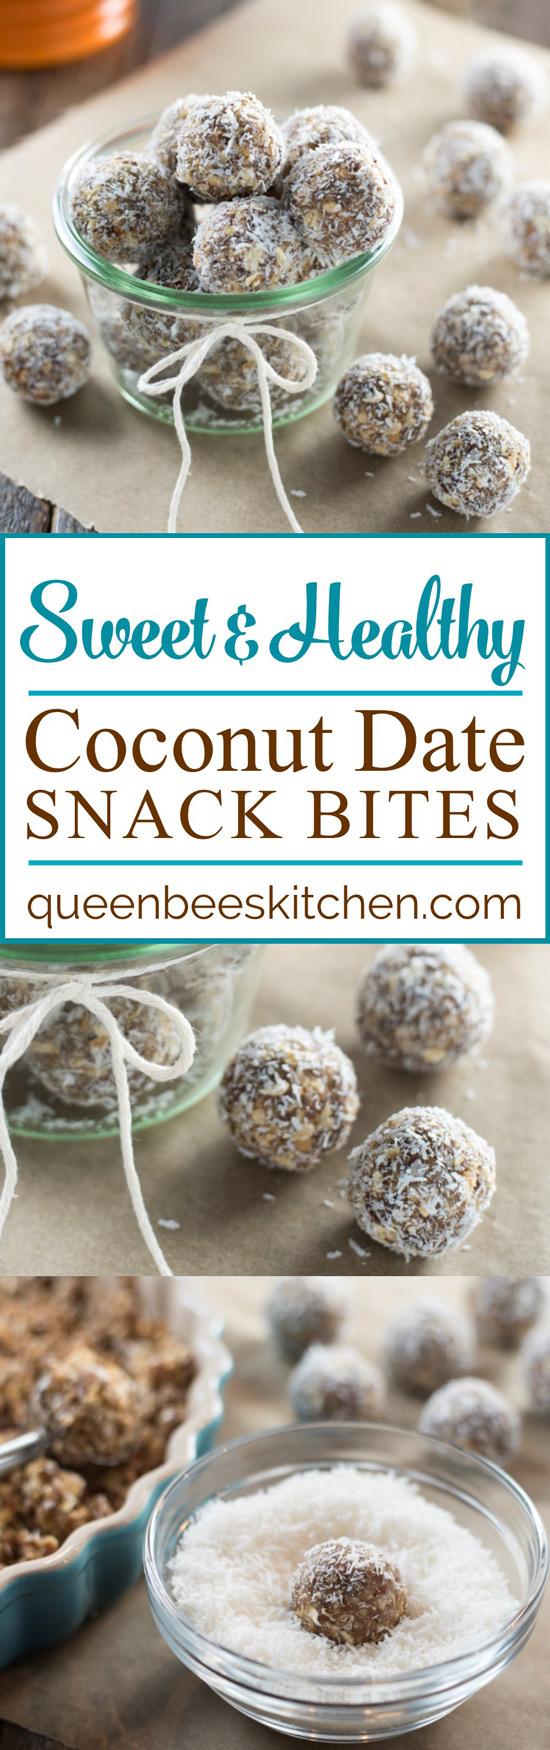 Coconut Date Snack Bites Pinterest